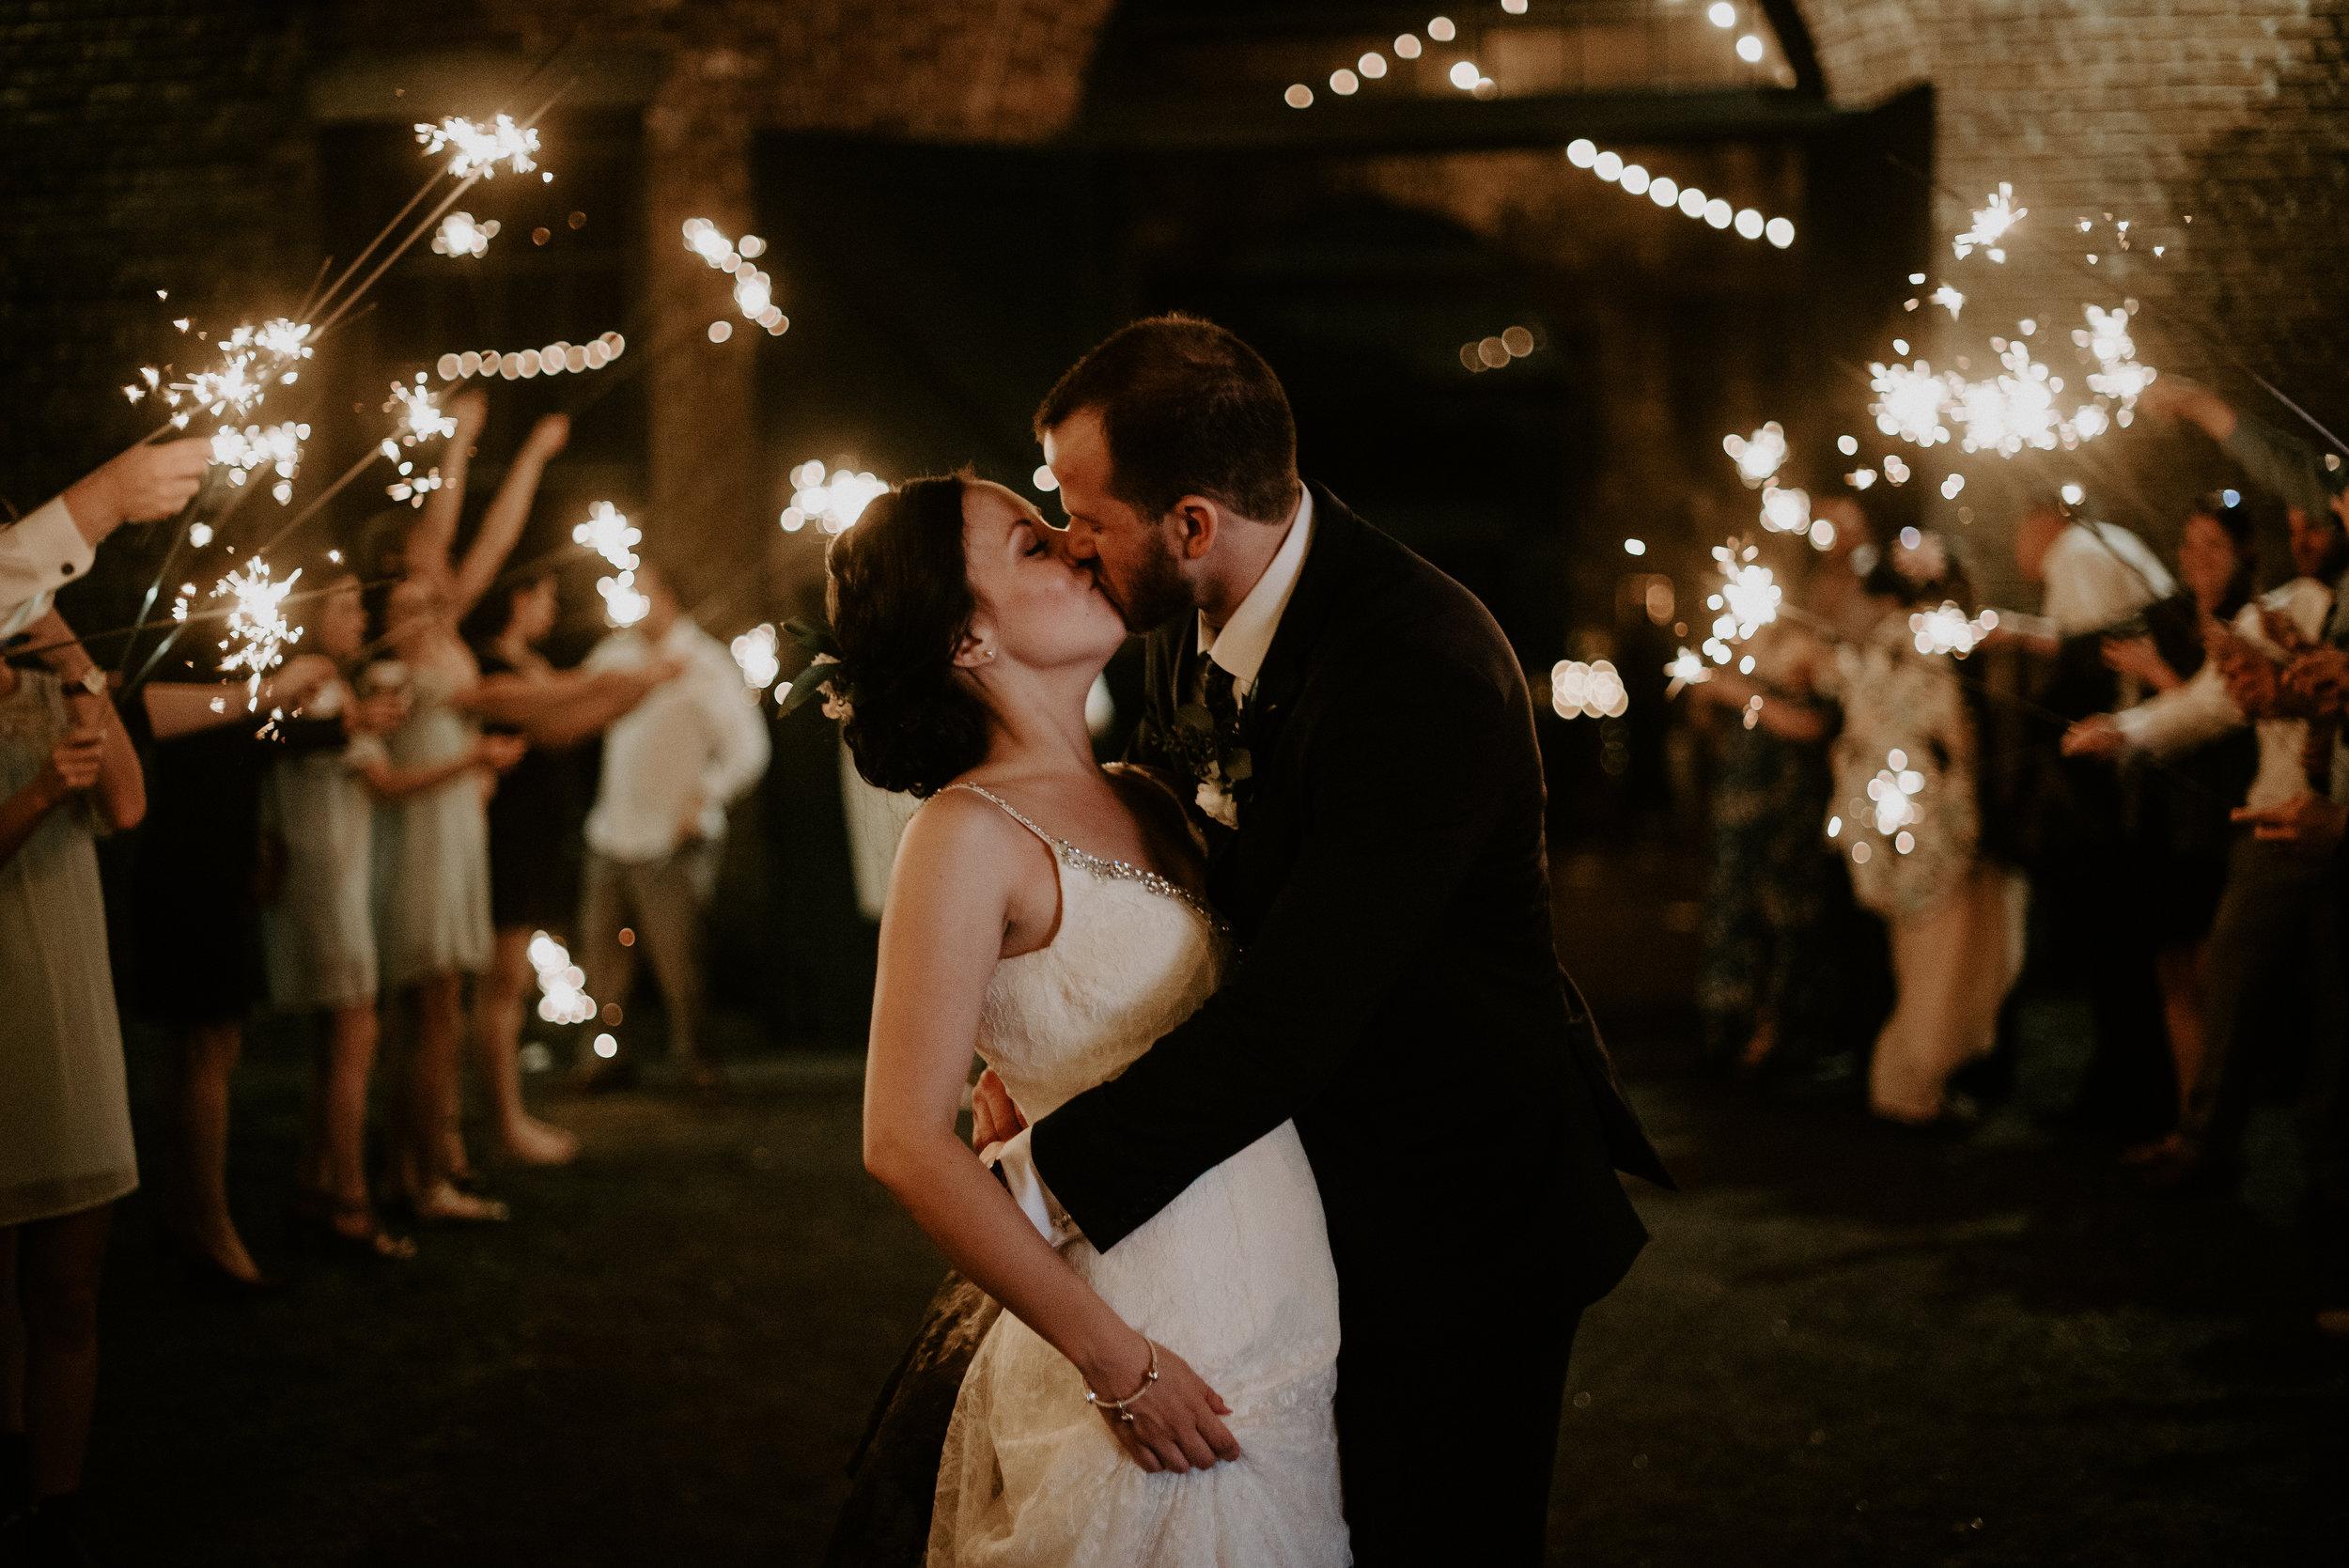 savannah-bridal-shop-andrea-and-mike-evergold-photography-georgia-state-railroad-museum-wedding-savannah-wedding-florist-savannah-wedding-planner-58.jpg